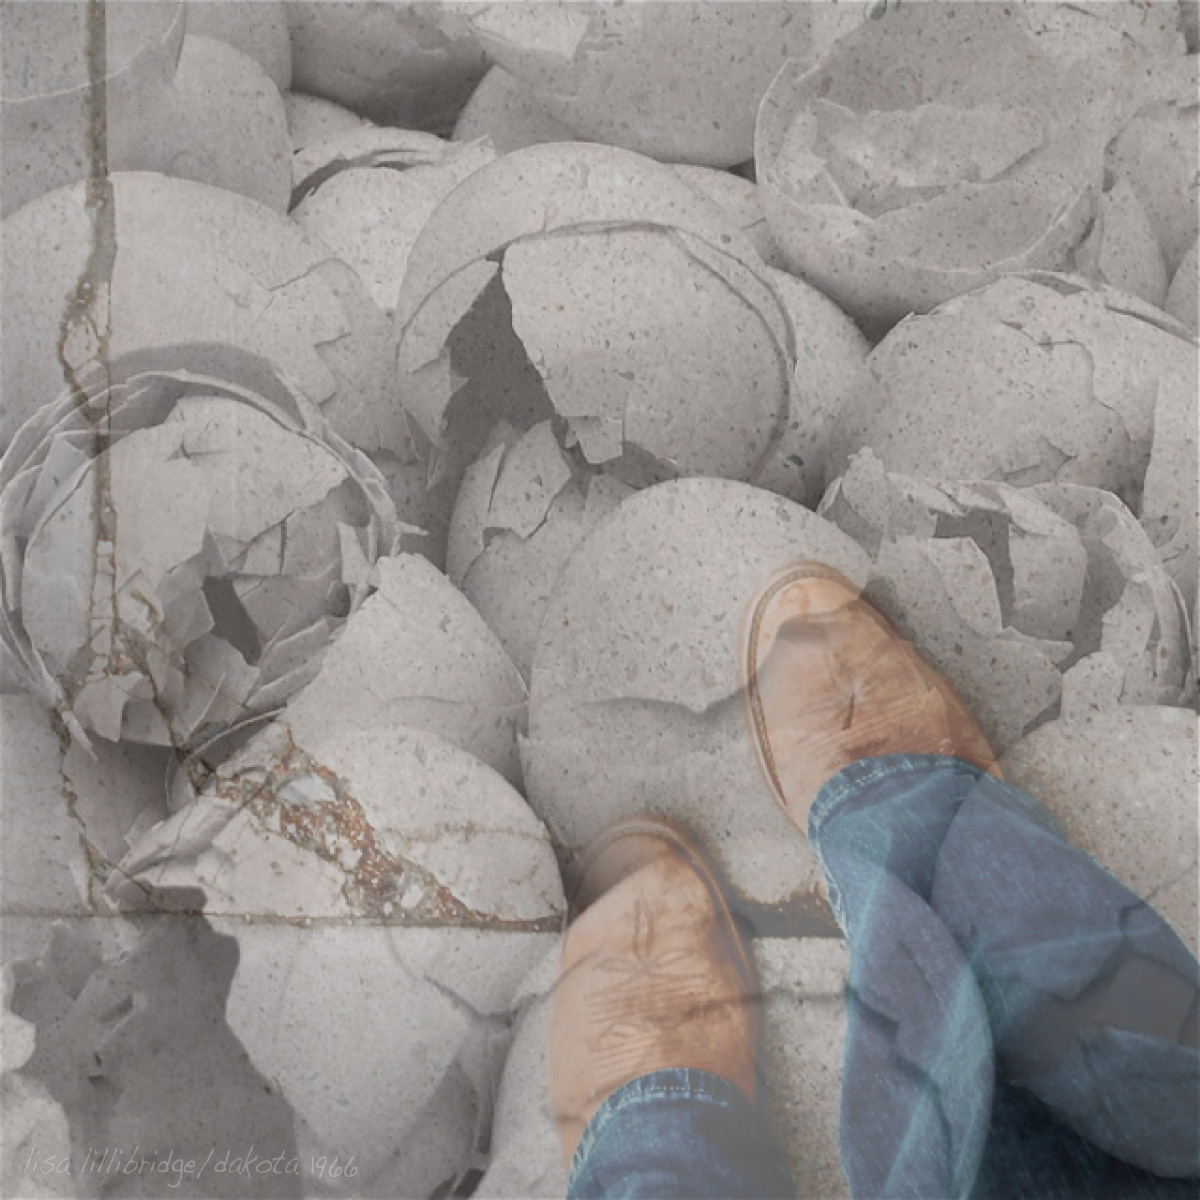 Lisa Lillibridge walking on eggshells dakota